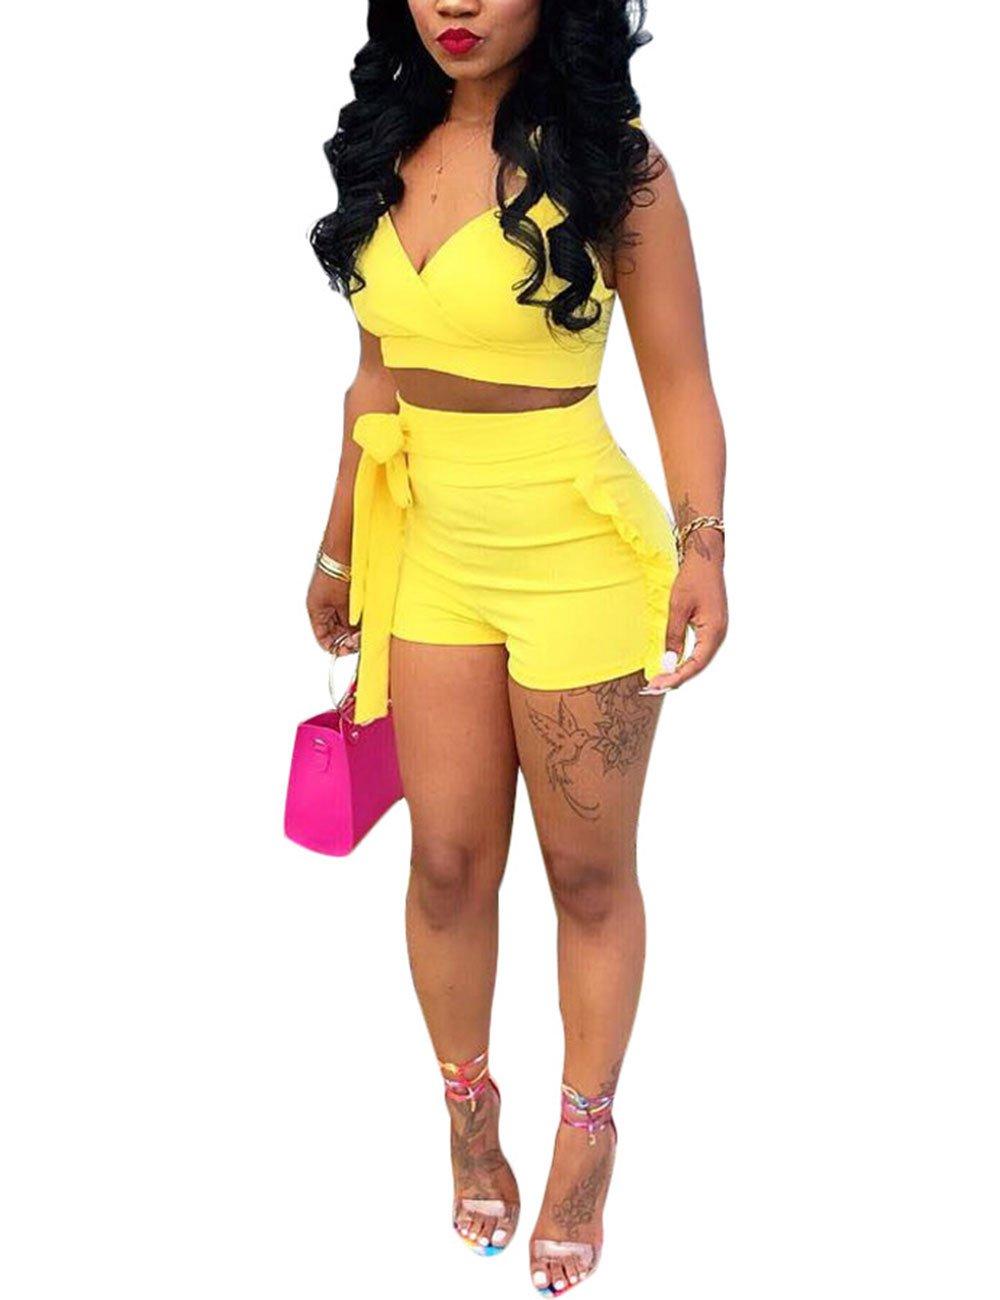 Women Ruffle 2 Piece Outfit V Neck Sleeveless Tank Crop Top and Shorts Set Yellow XL